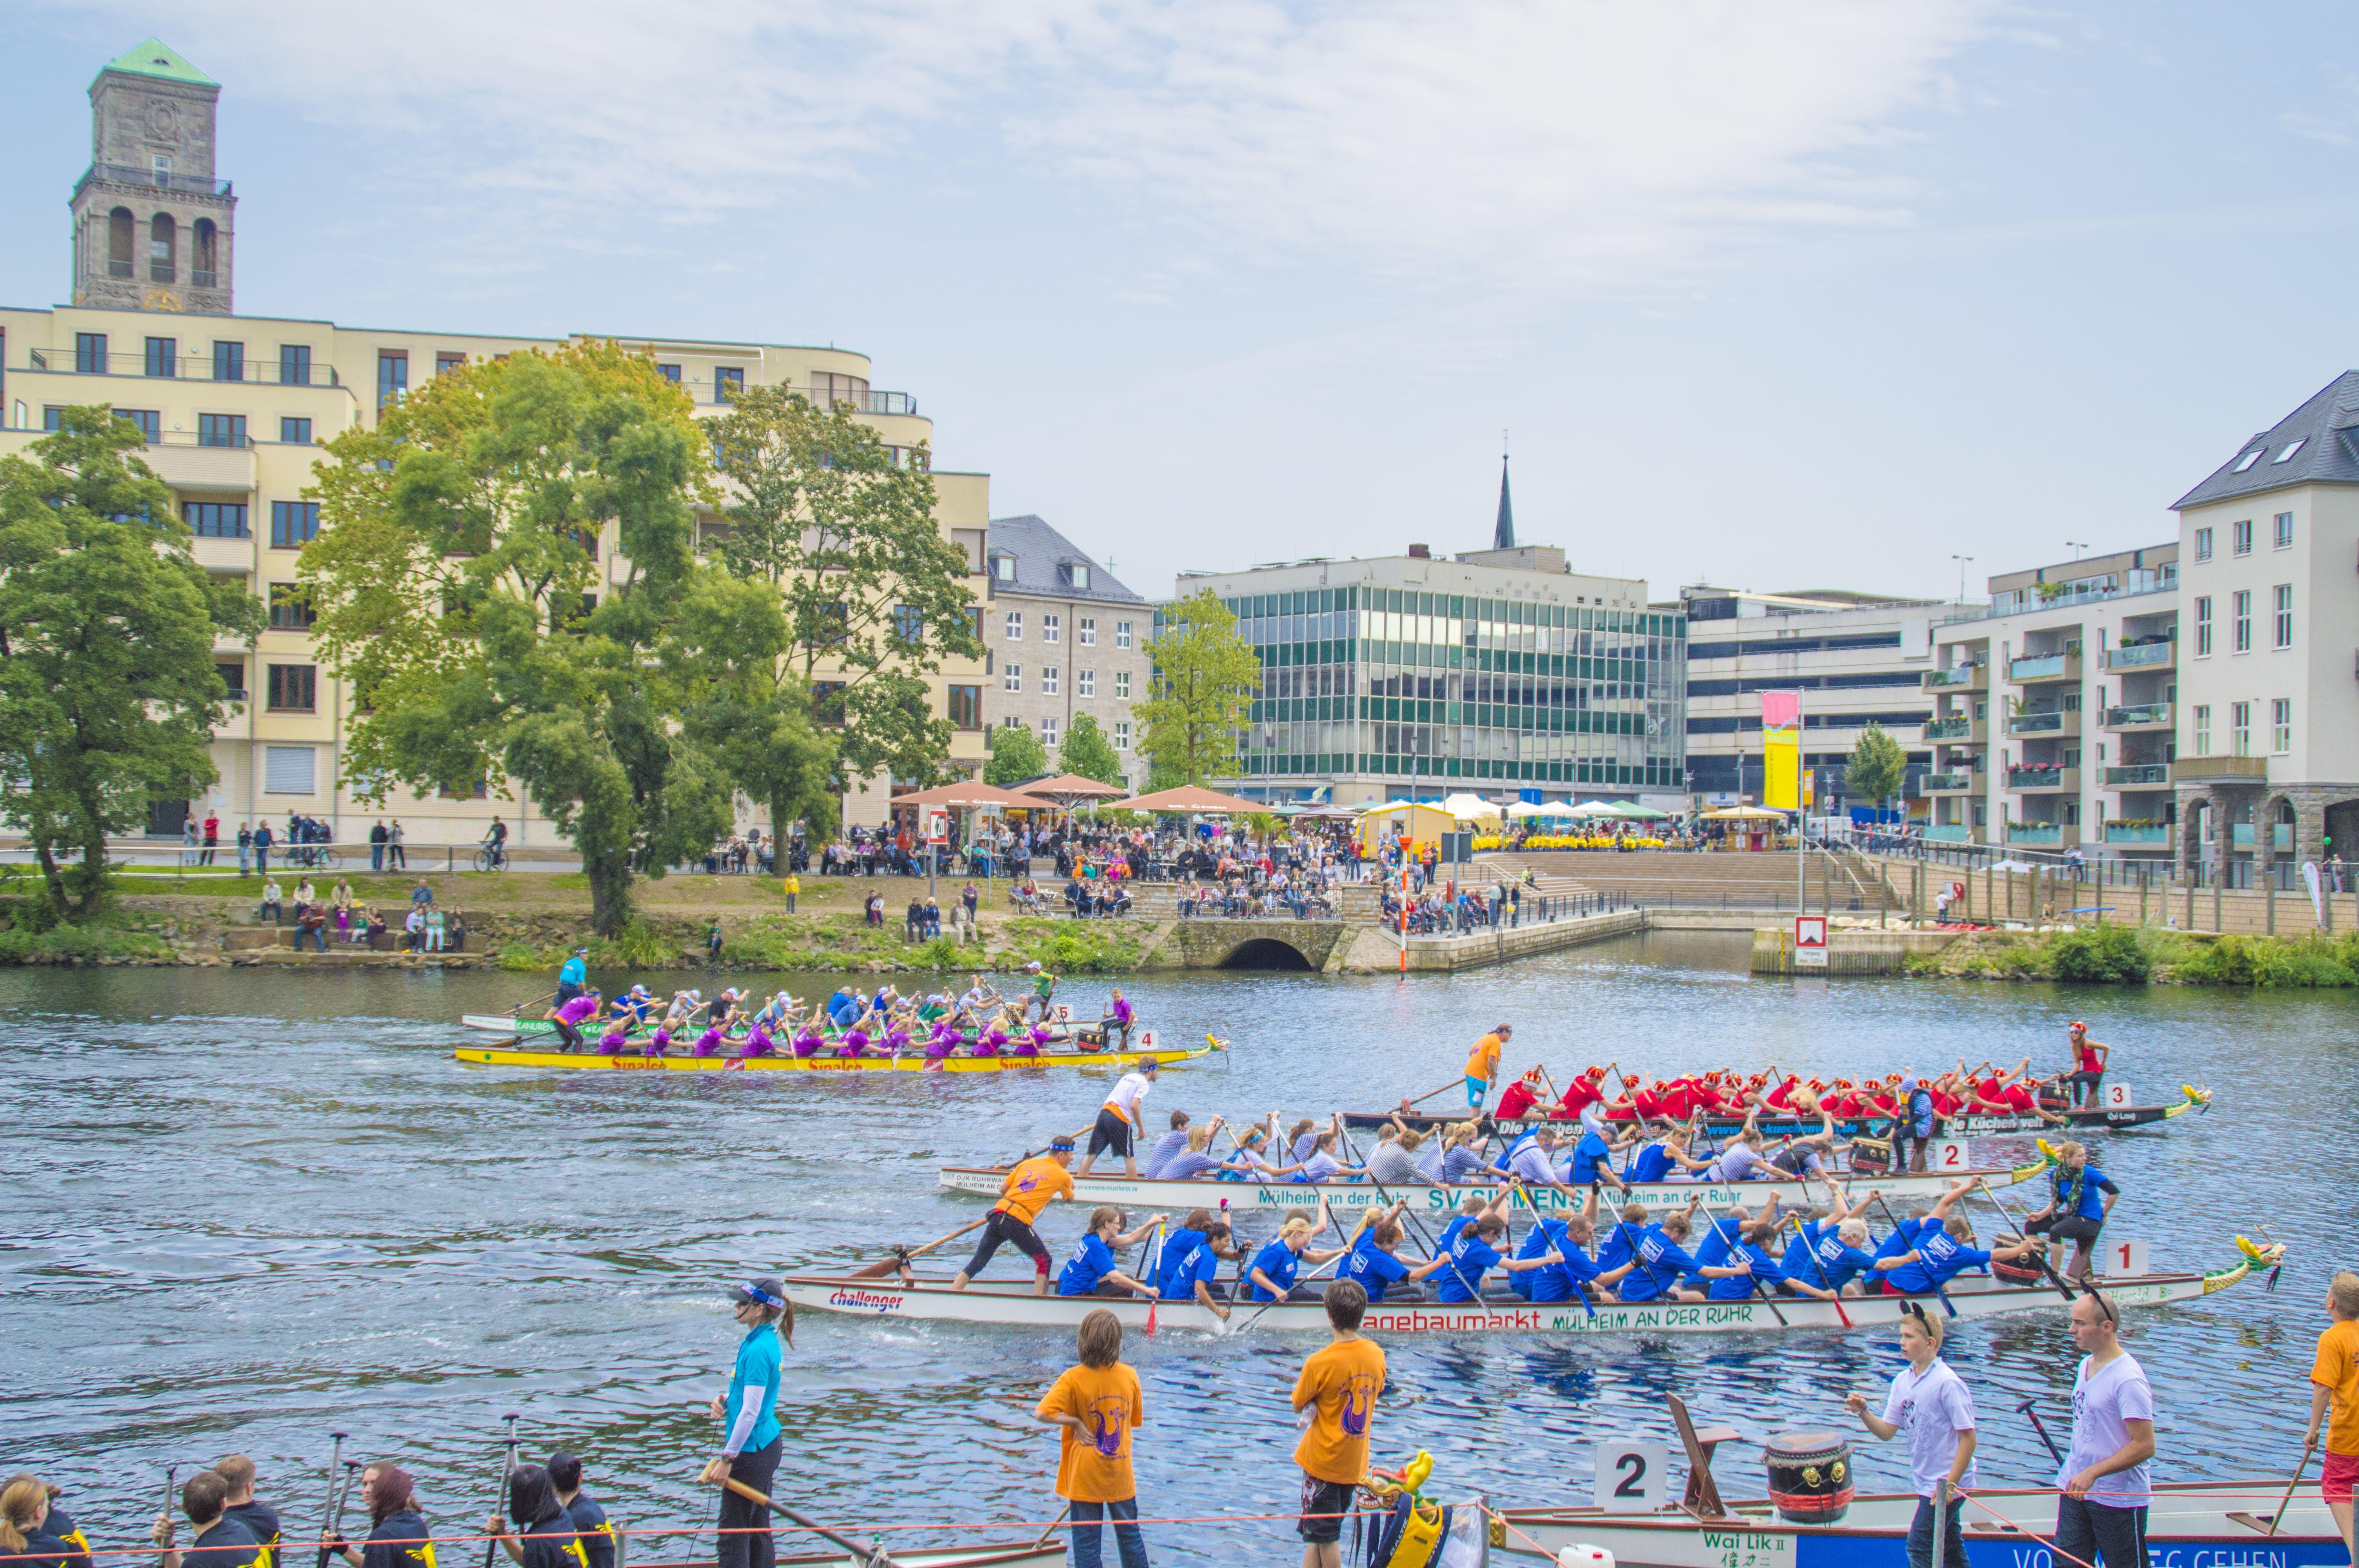 19. Drachenboot-Festival in Mülheim an der Ruhr 2015